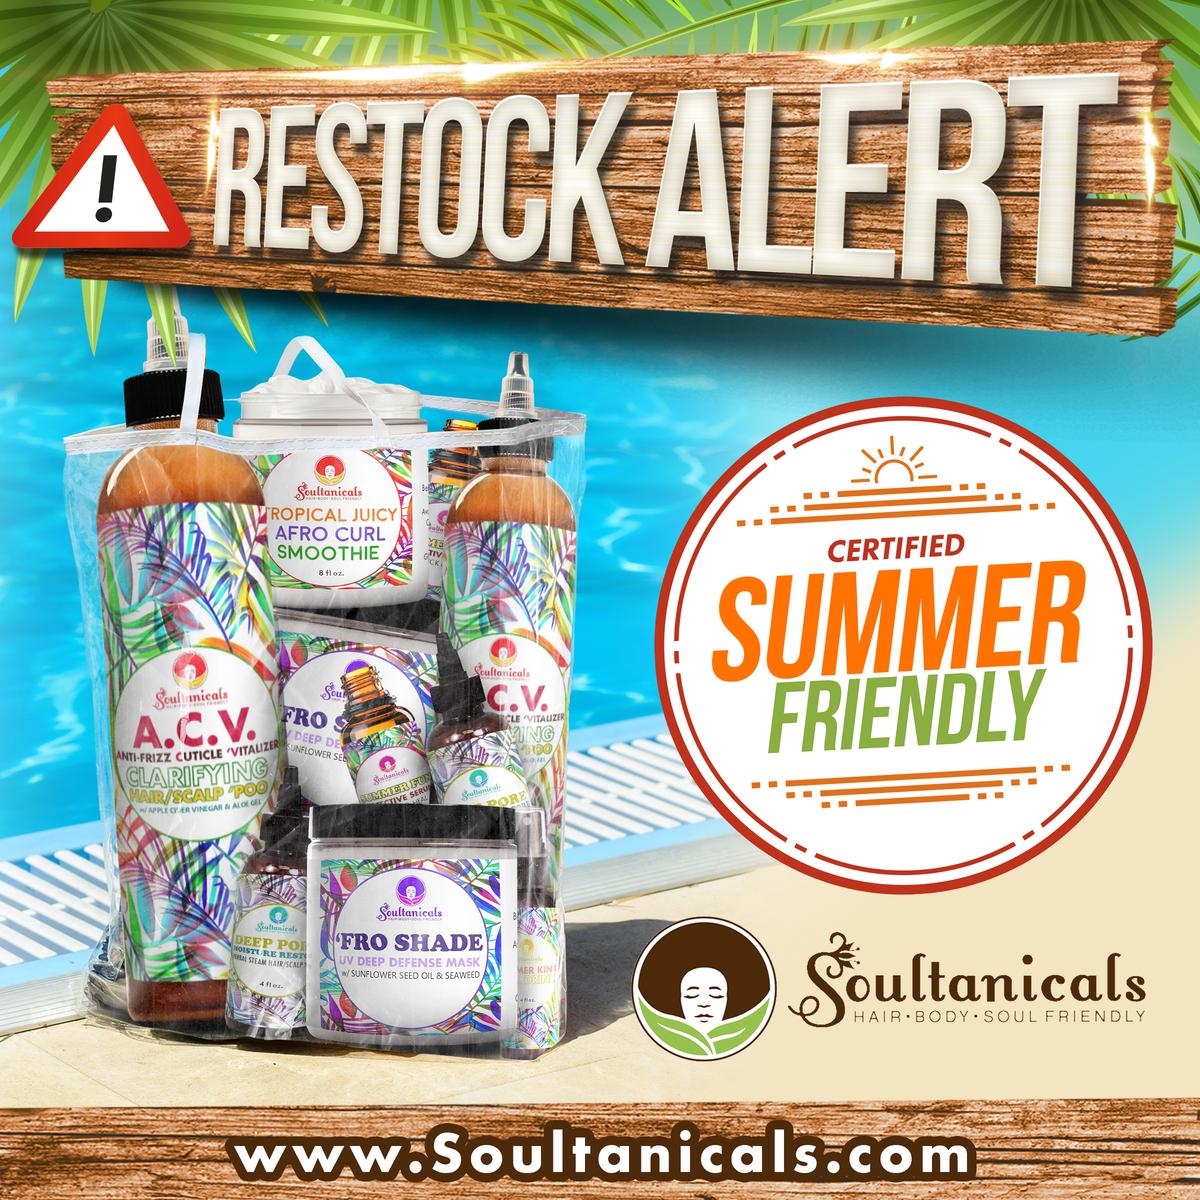 8x8 Summer Bundle Restock Ad